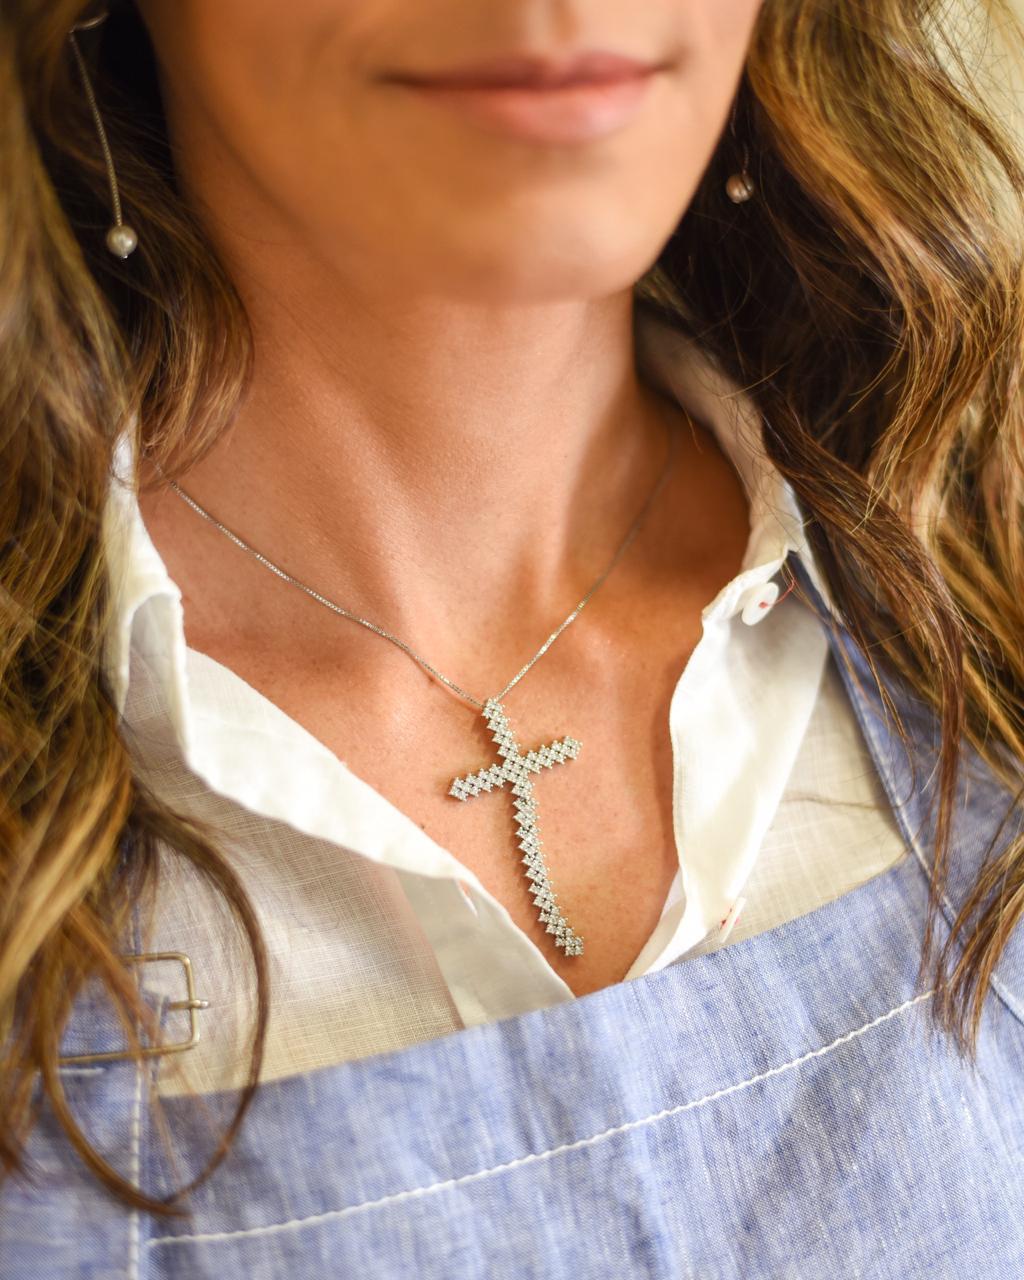 Colar Crucifixo Maleável Microcravejado Zircônias Ródio